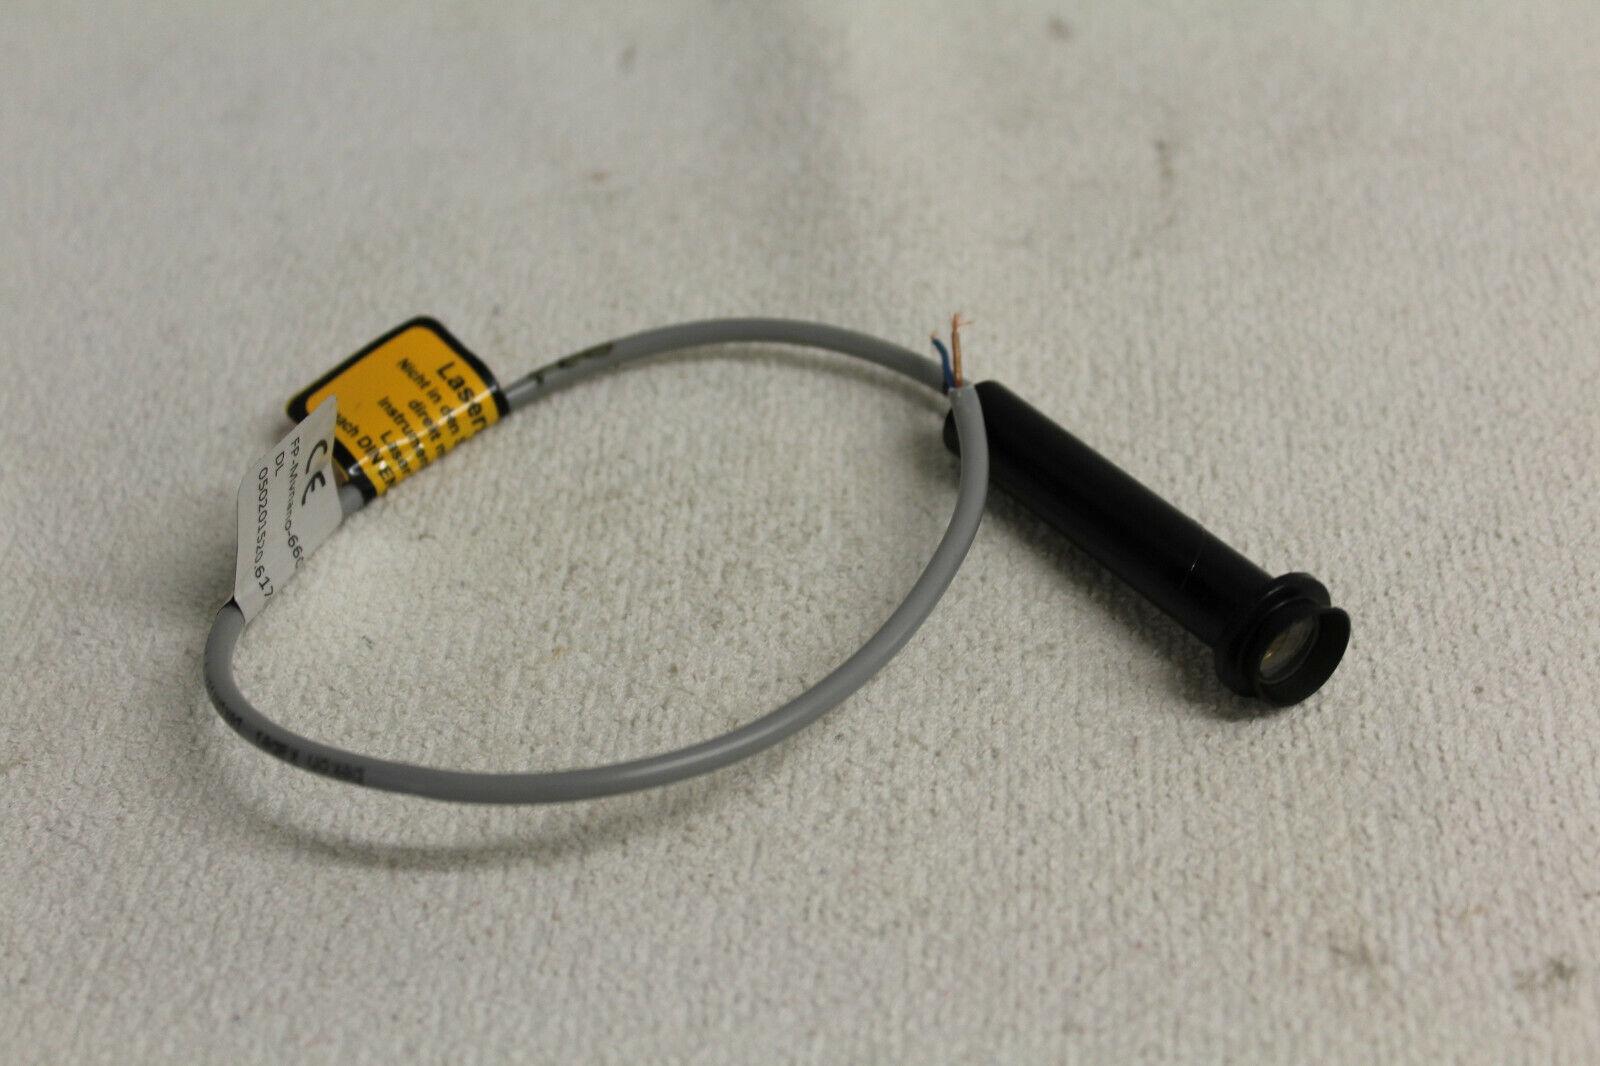 Blau FP-Mvnano-660-F250-DL Mini Line laser